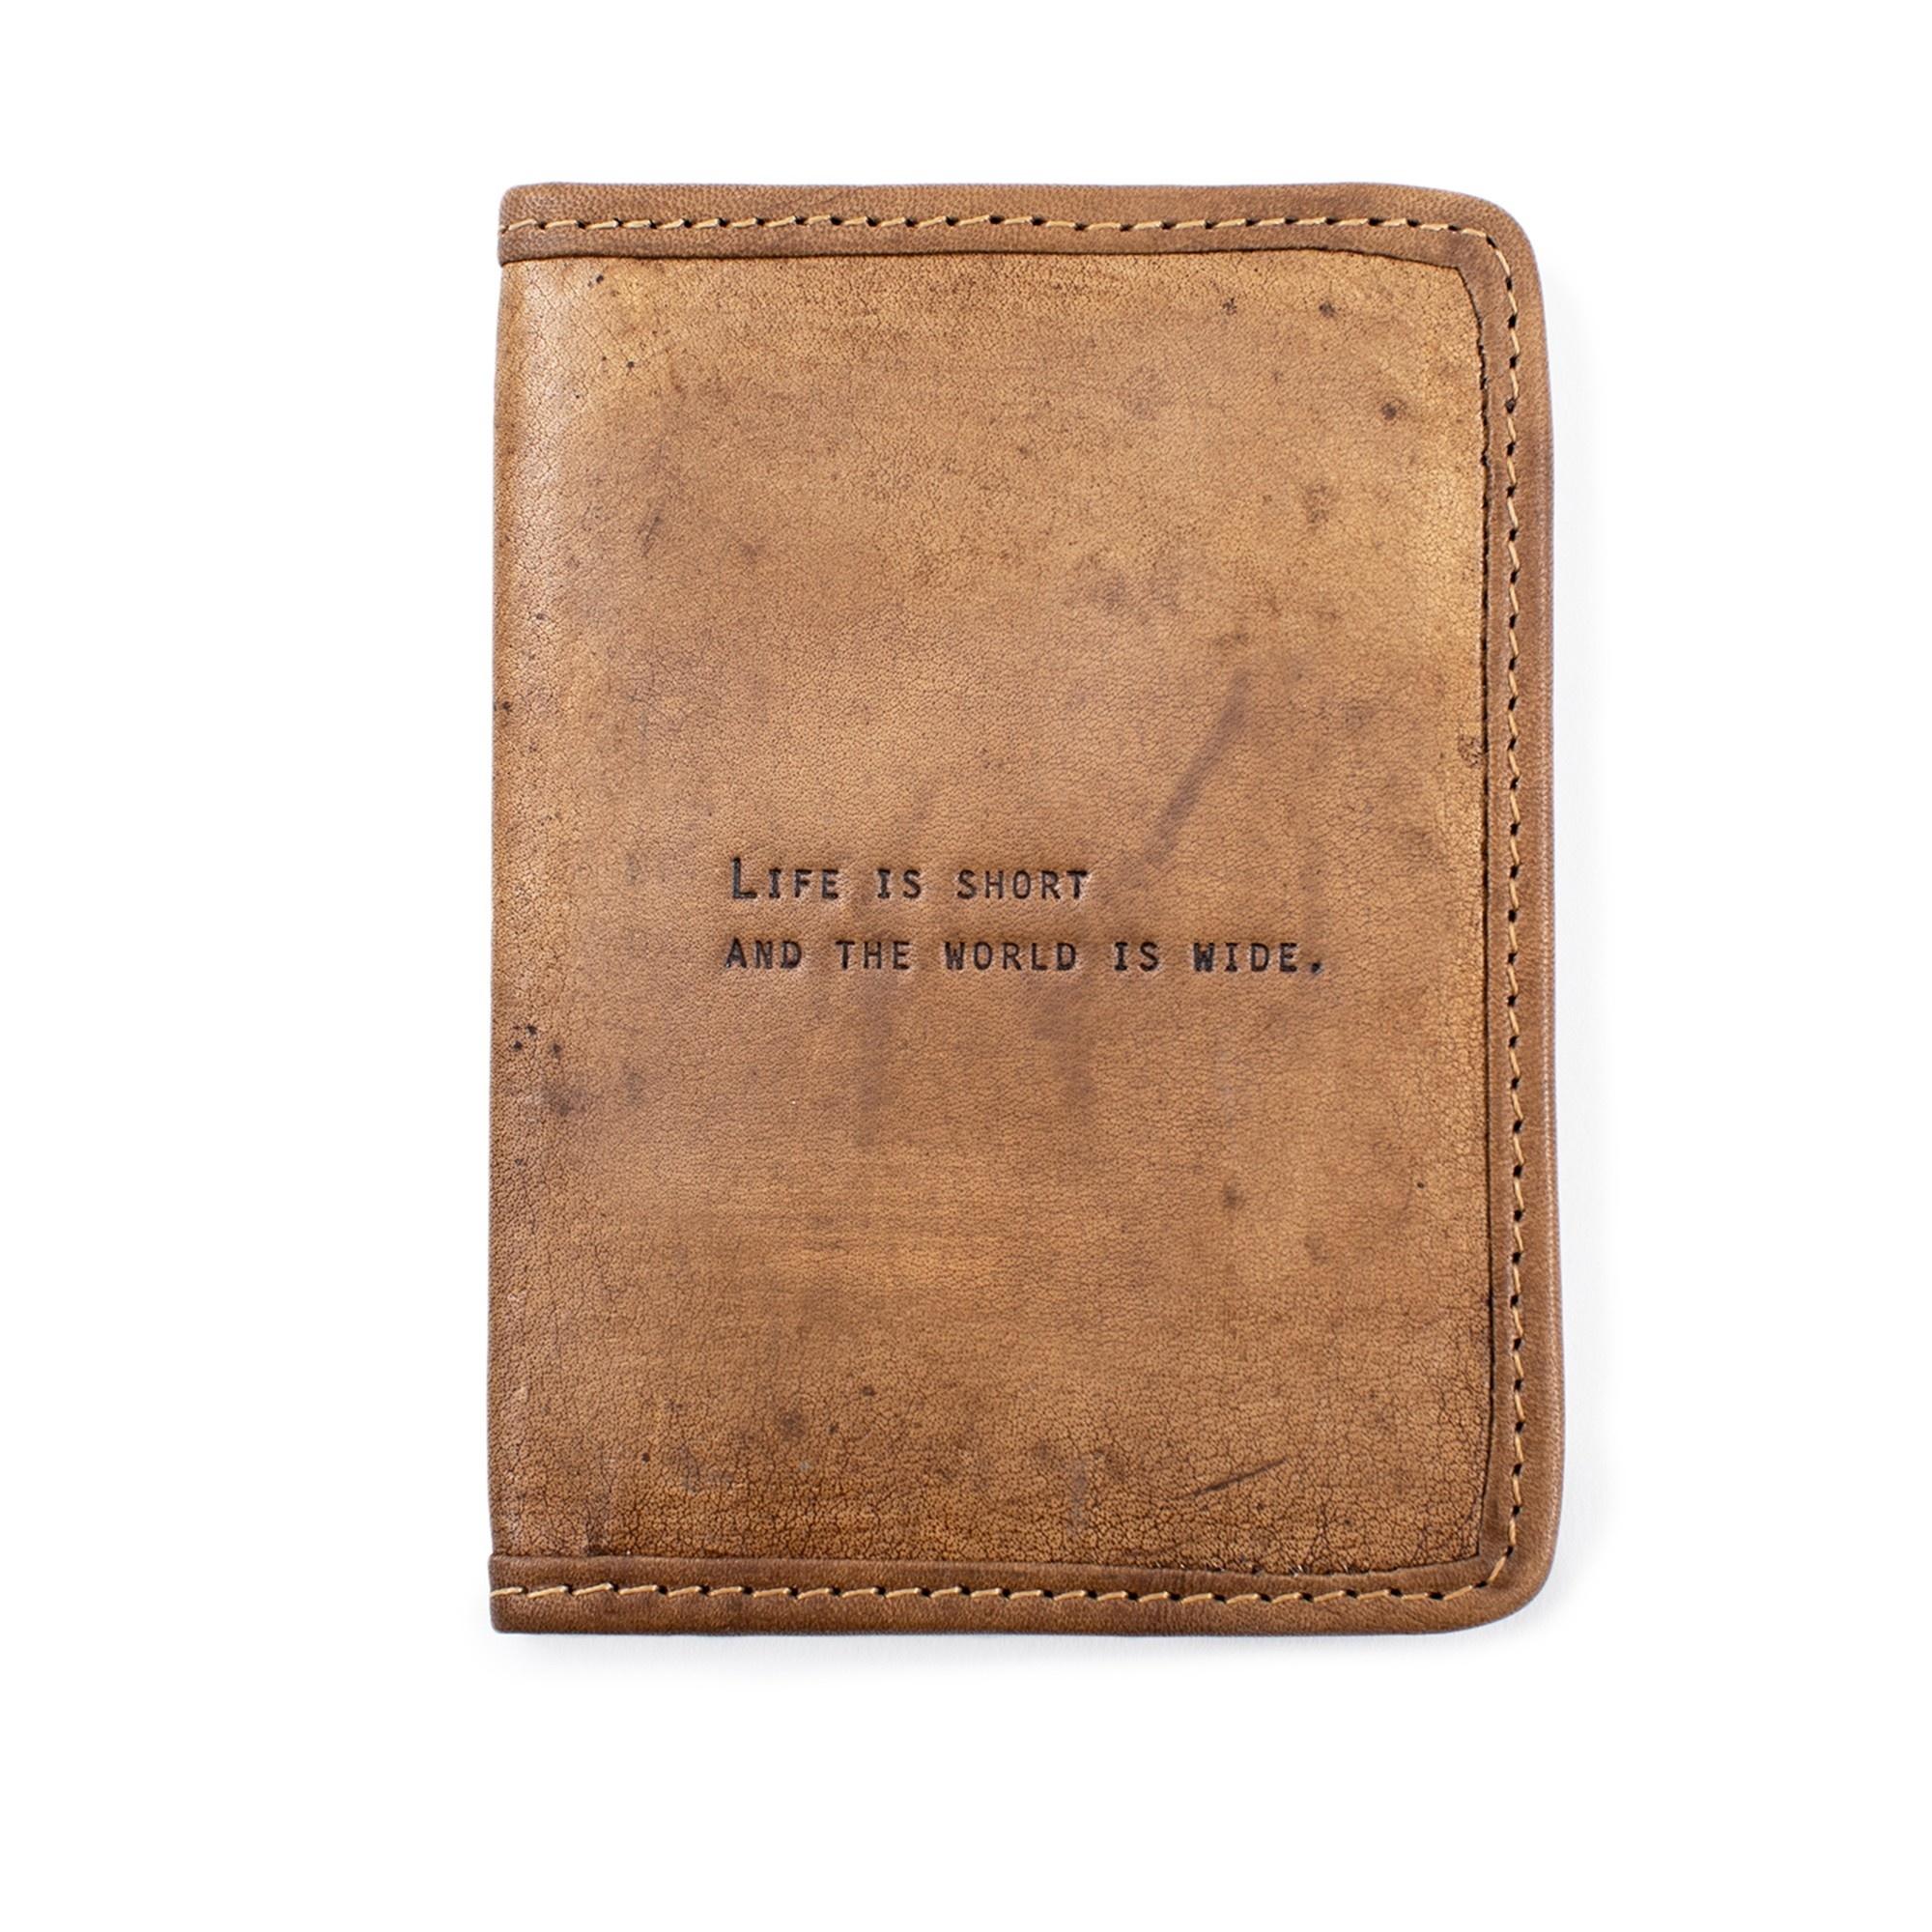 Sugarboo Passport Cover